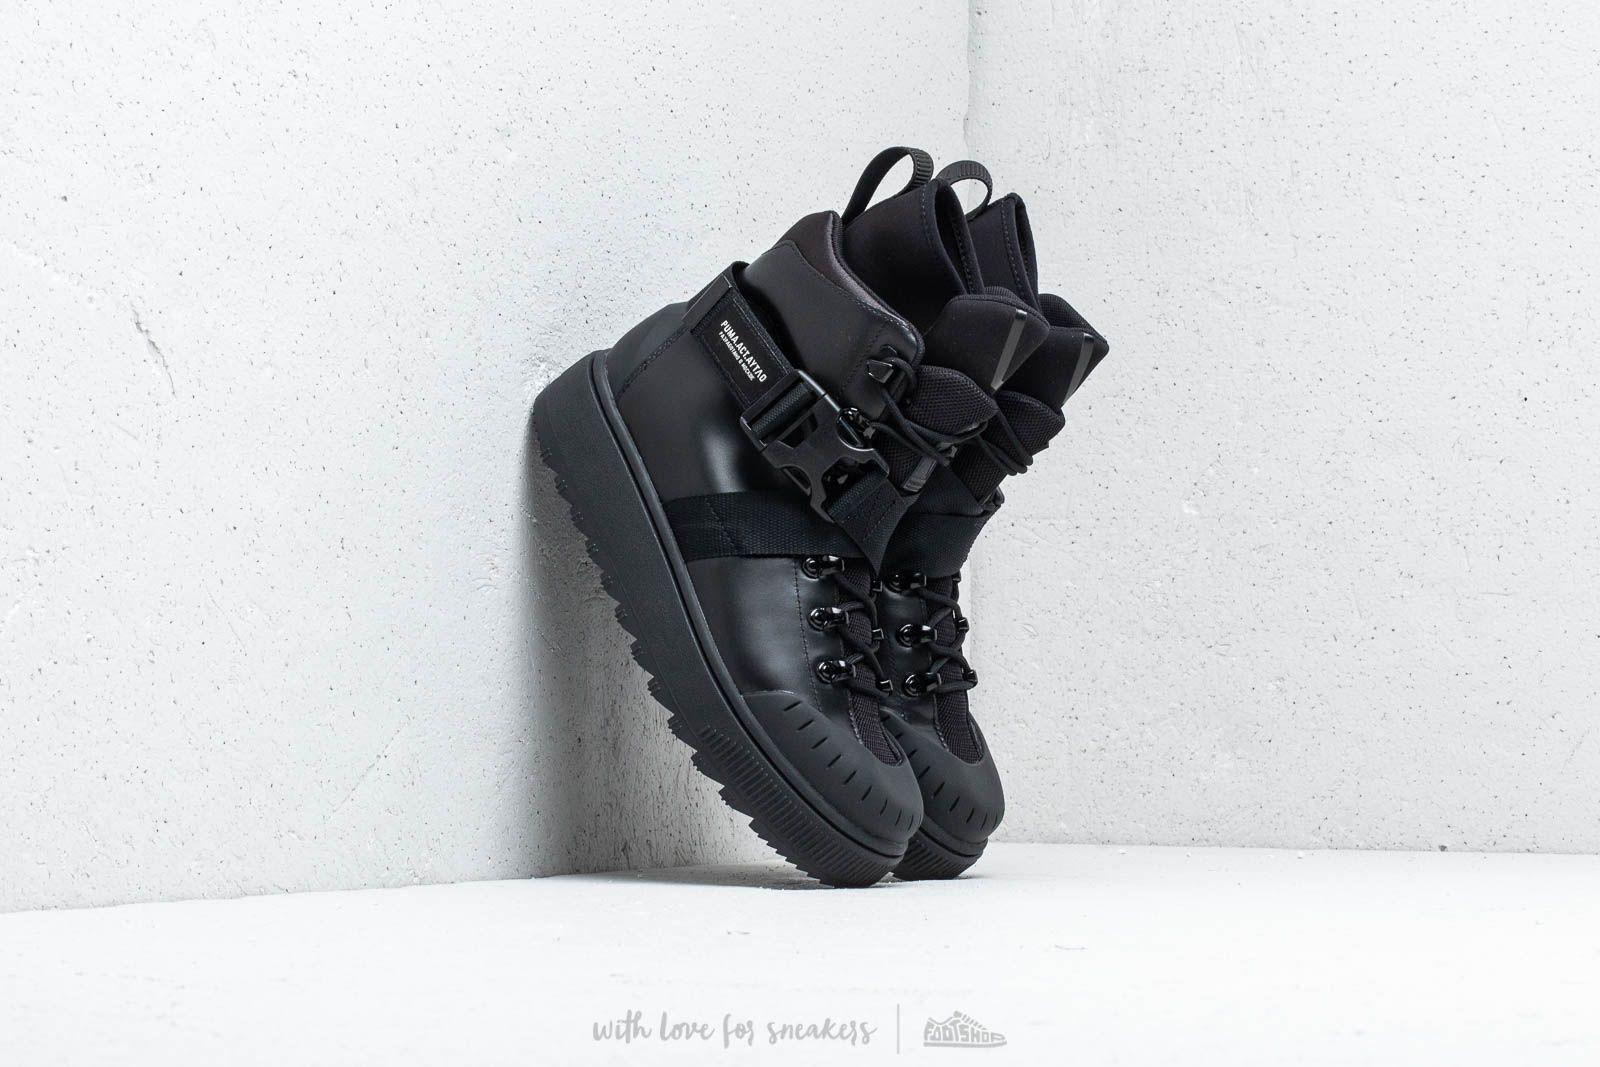 94155a1d780c Puma x Outlaw Moscow Ren Boot Puma Black